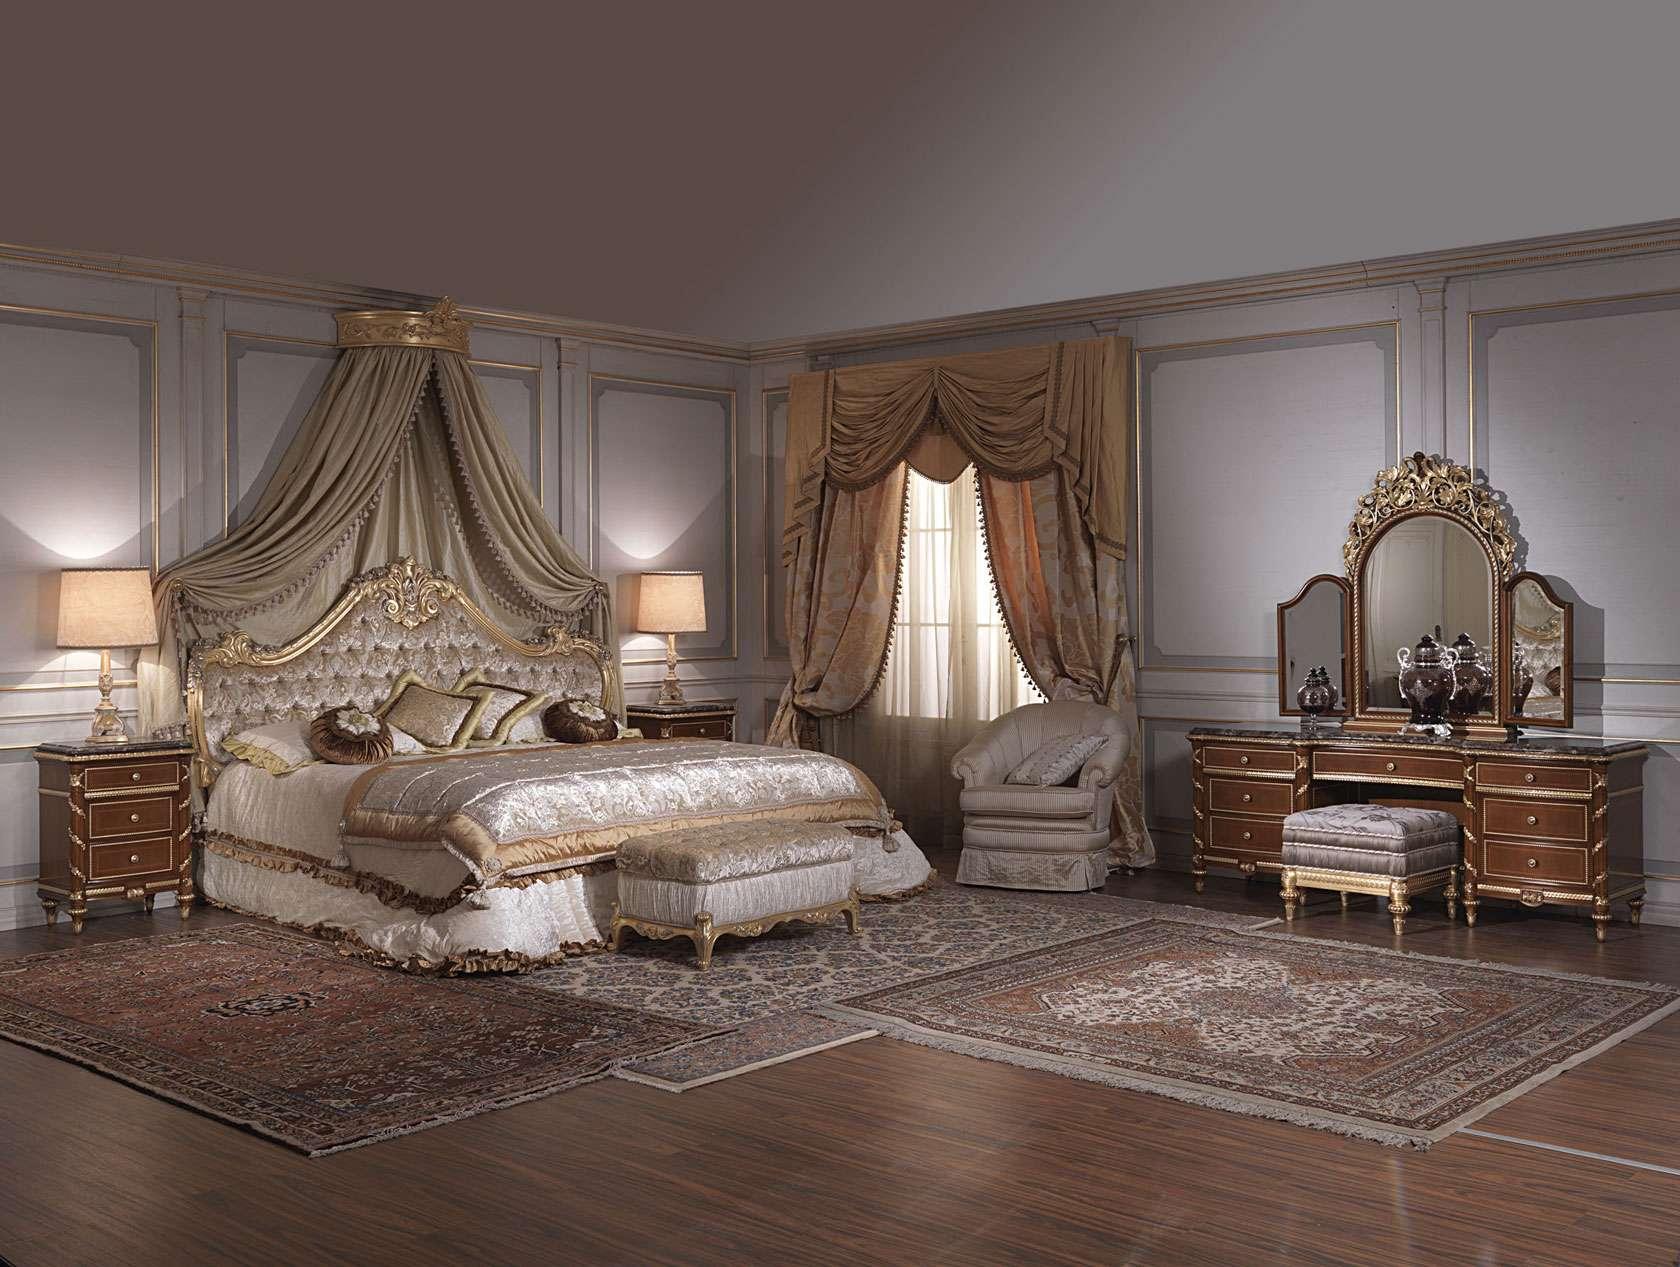 Chambre Italienne. Appartement Louer Chambre Avec Placards Salle ...